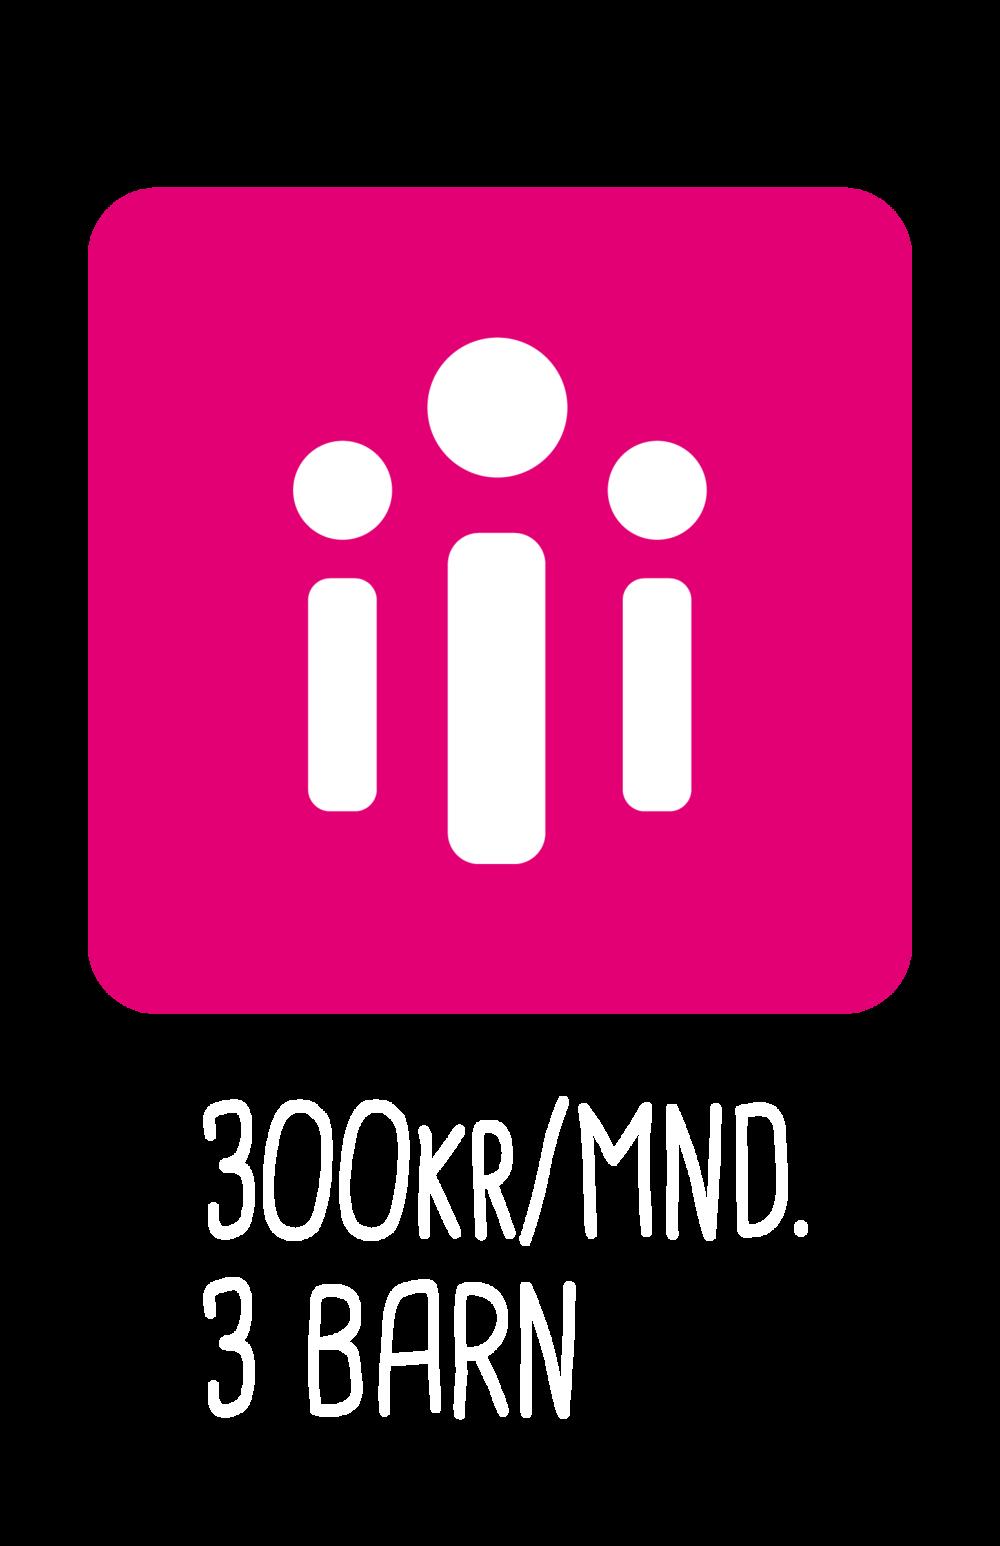 Donate 300KR/MND. 3 Barn